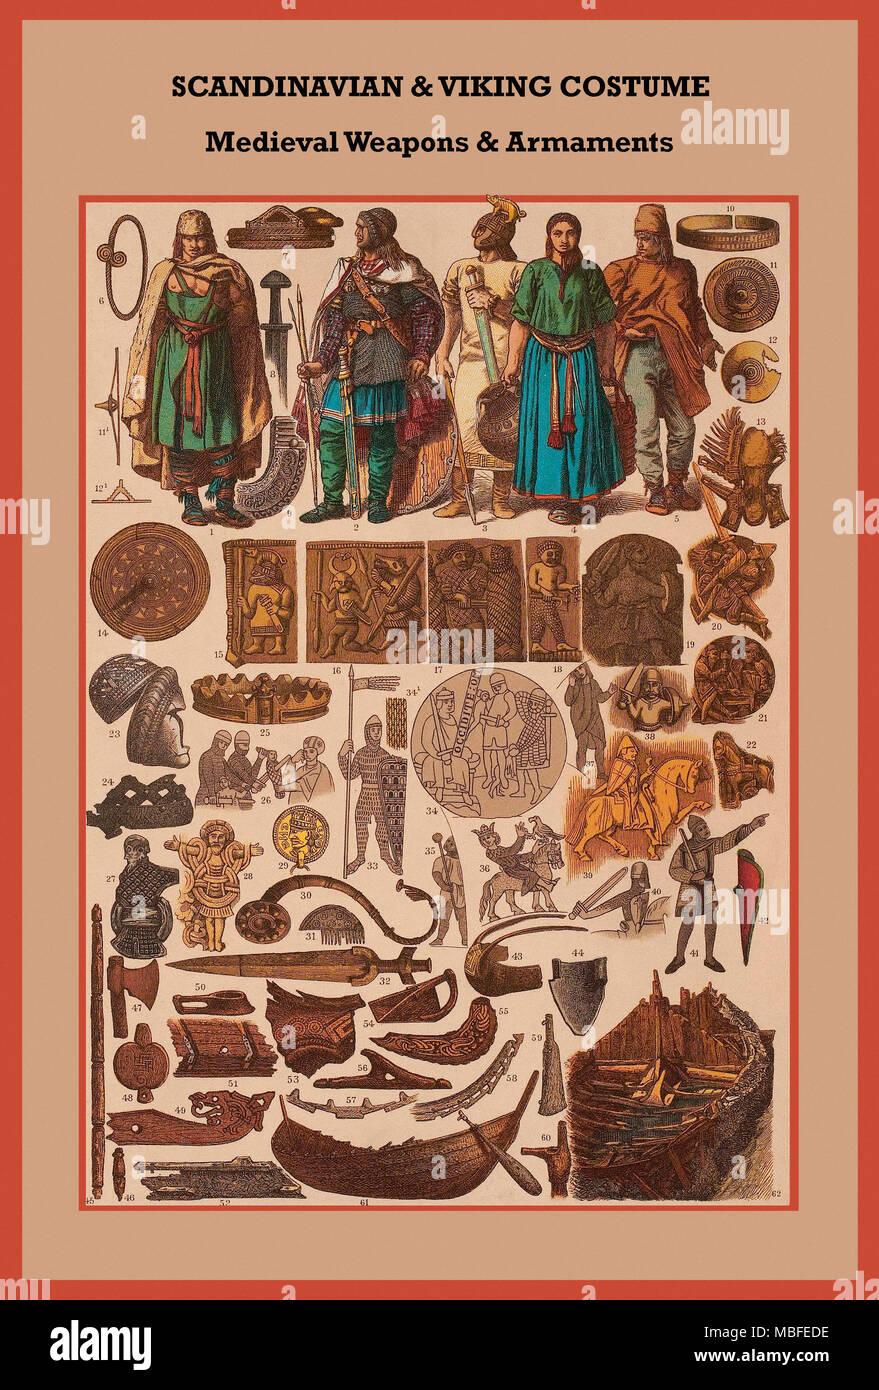 Scandinavian & Viking costume Medieval weapons & armaments - Stock Image